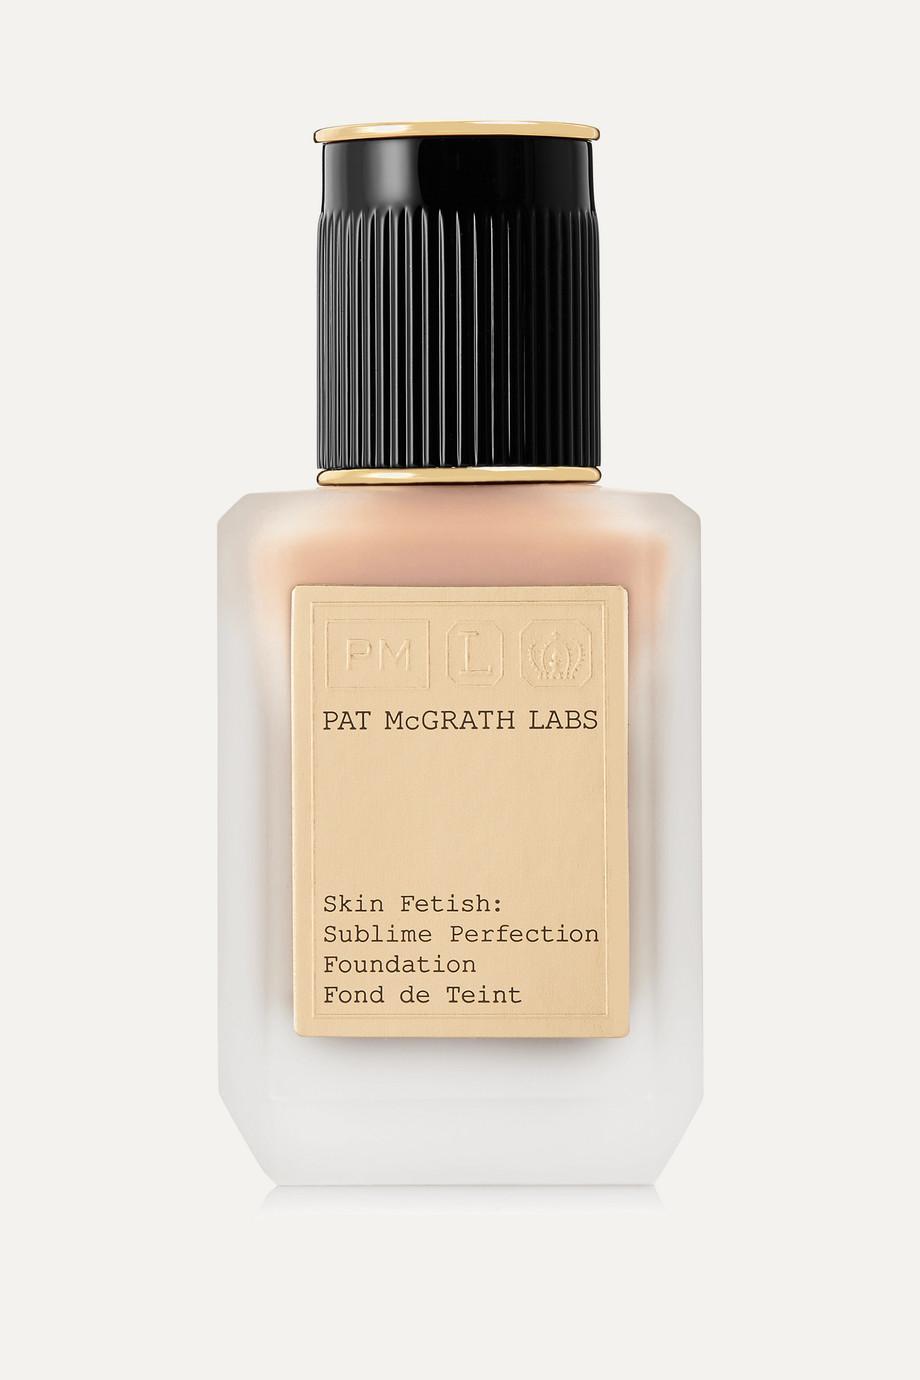 Pat McGrath Labs Skin Fetish: Sublime Perfection Foundation - Light 4, 35ml